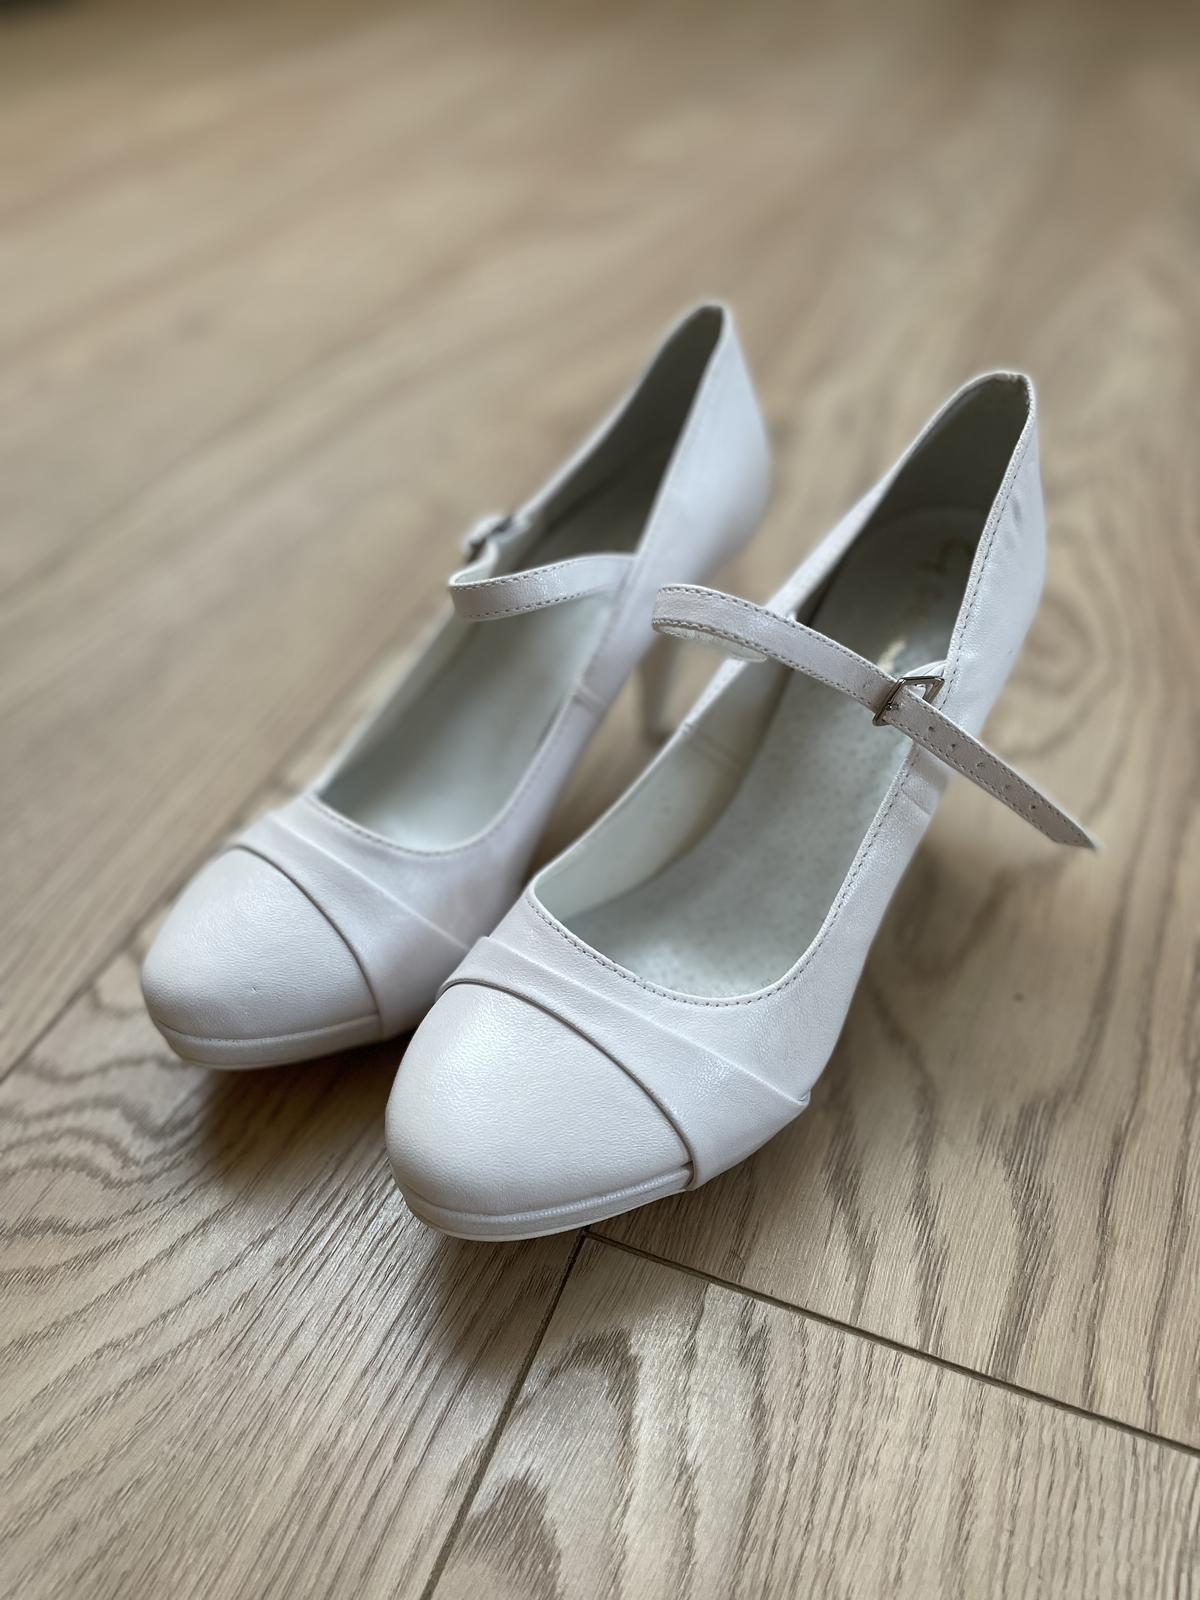 Svadobné topánky veľ. 38 - Obrázok č. 1